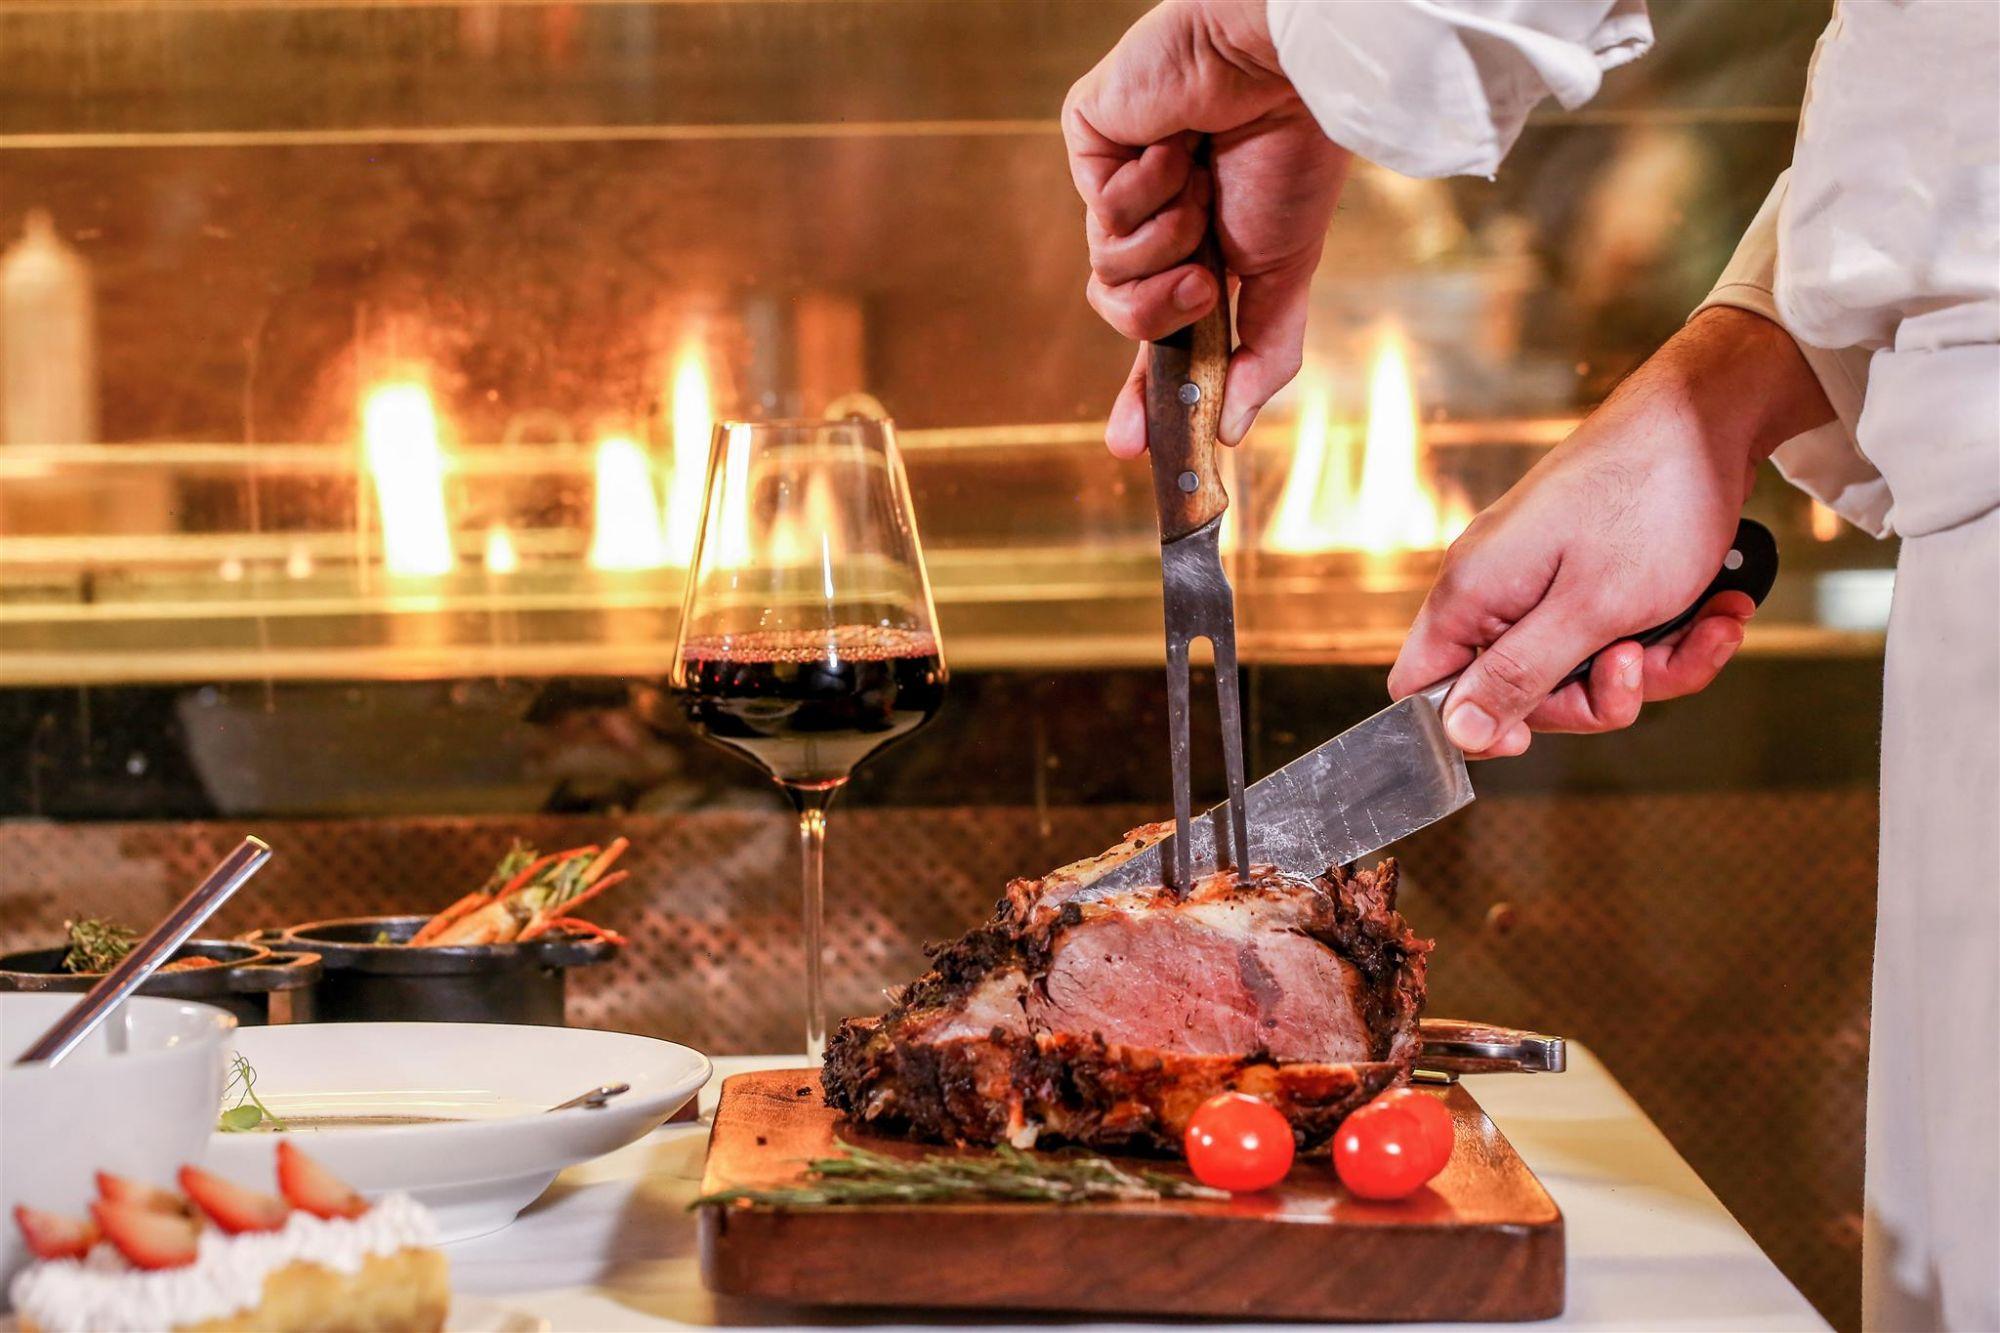 Unlimited Steaks On Weekends At CRU Steakhouse